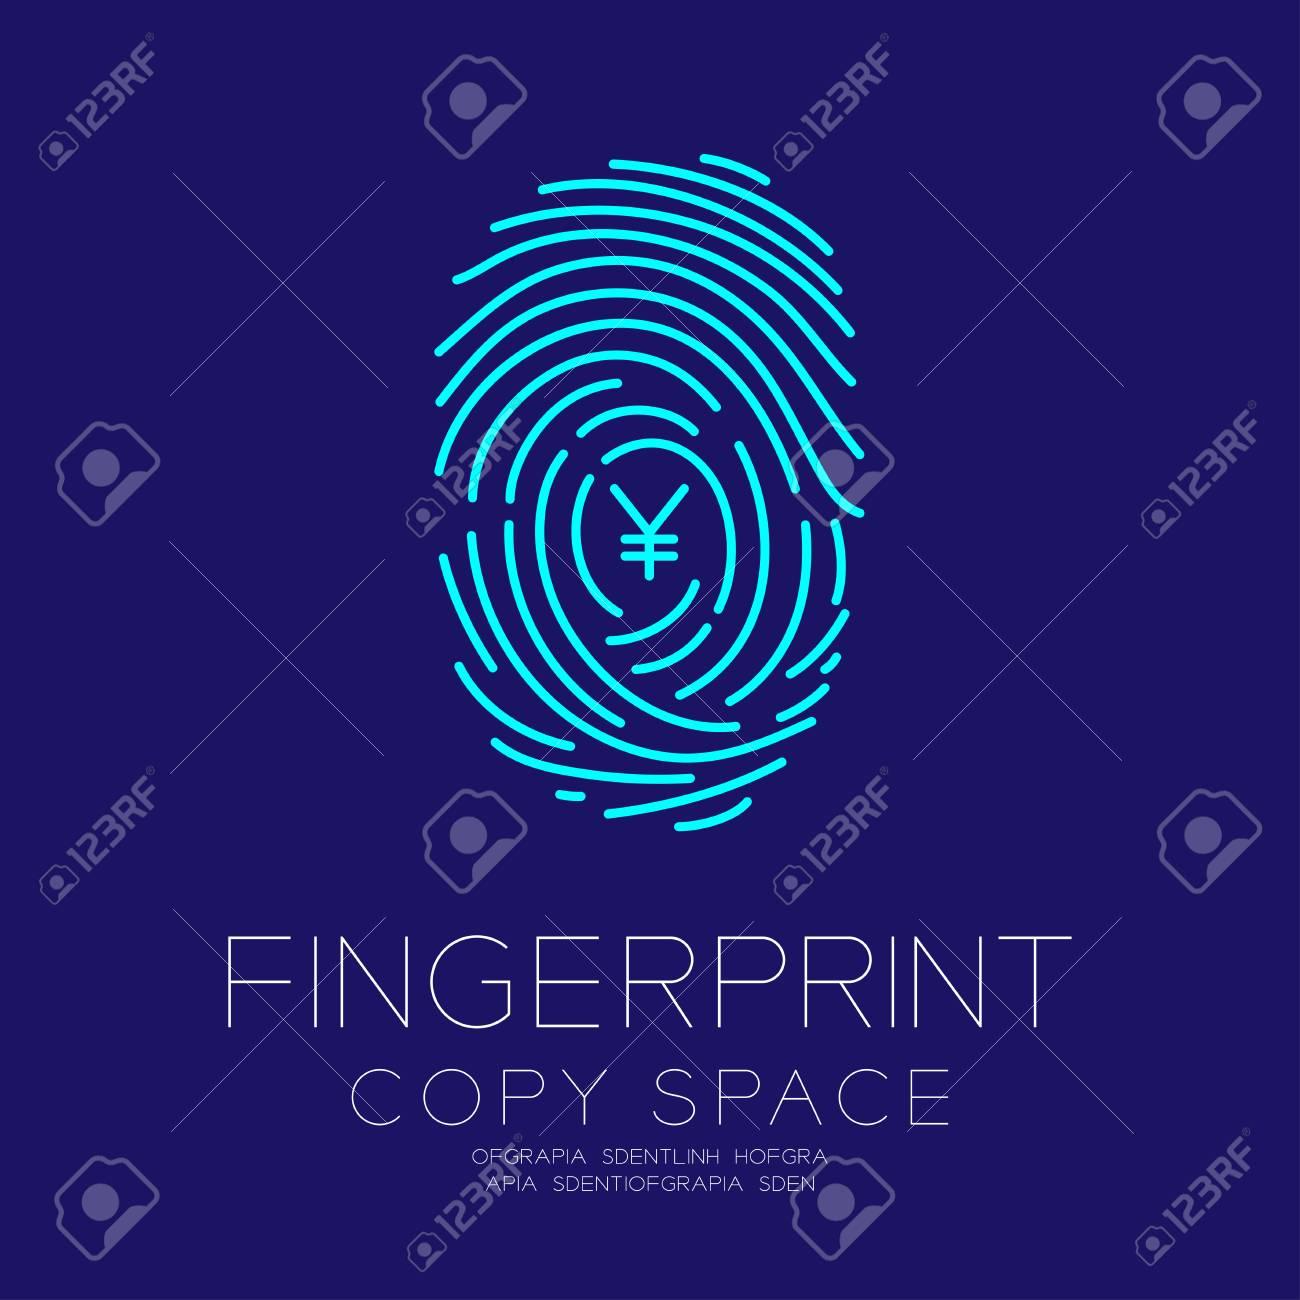 Fingerprint Scan Set With Currency Jpy Japanese Yen Symbol